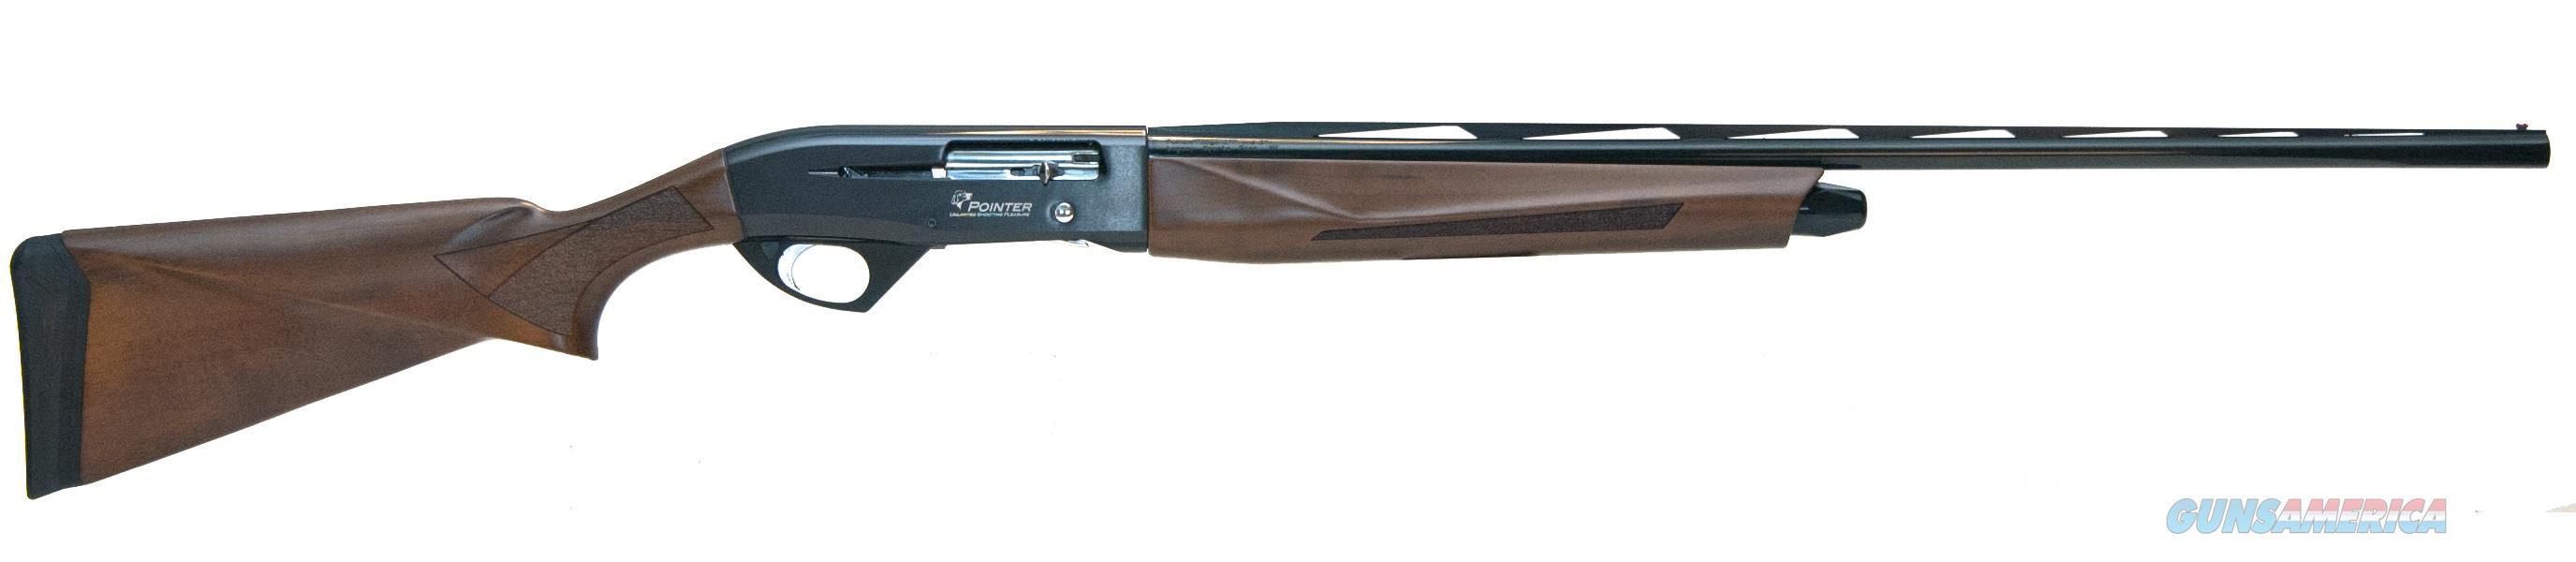 "Legacy Sports Pointer 28 GA Walnut 28"" 5 Rds KPS28A028W   Guns > Shotguns > Howa Shotguns"